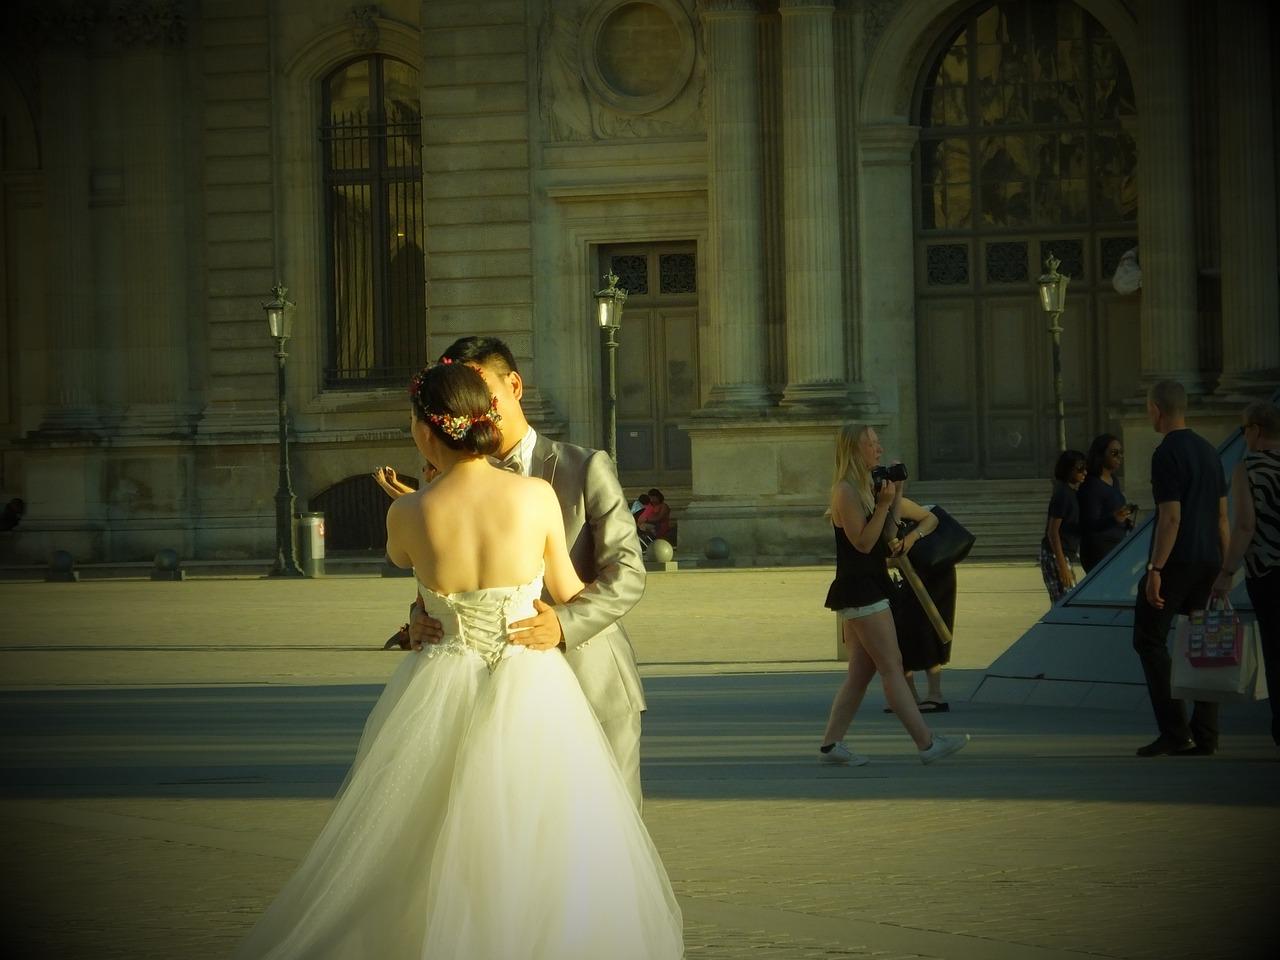 Paris Las Vegas Wedding Chapel  TripAdvisor